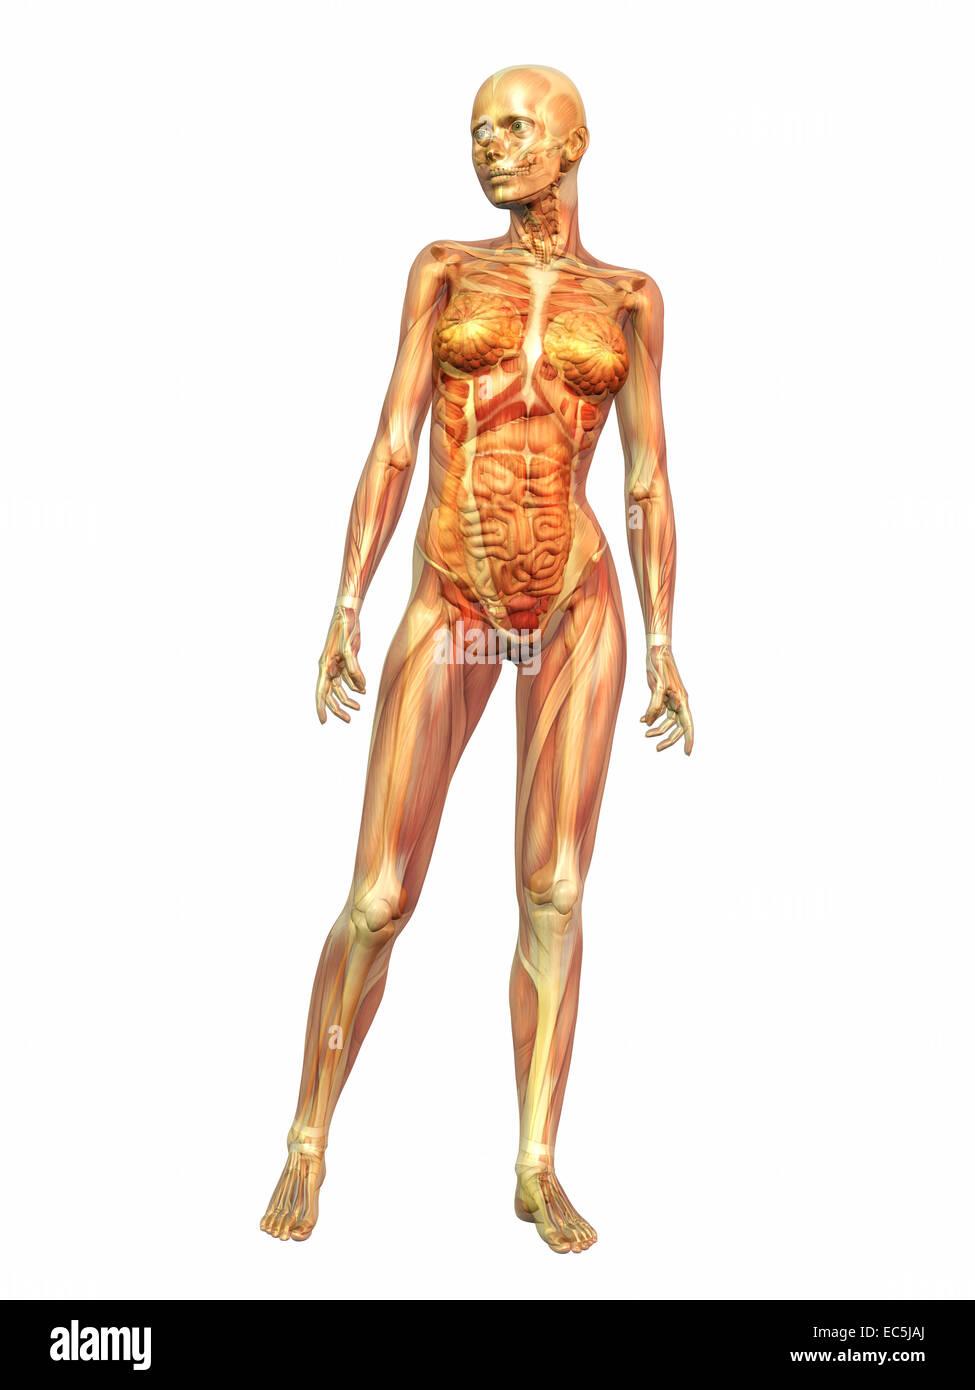 Woman Skeleton Muscles Stockfotos & Woman Skeleton Muscles Bilder ...